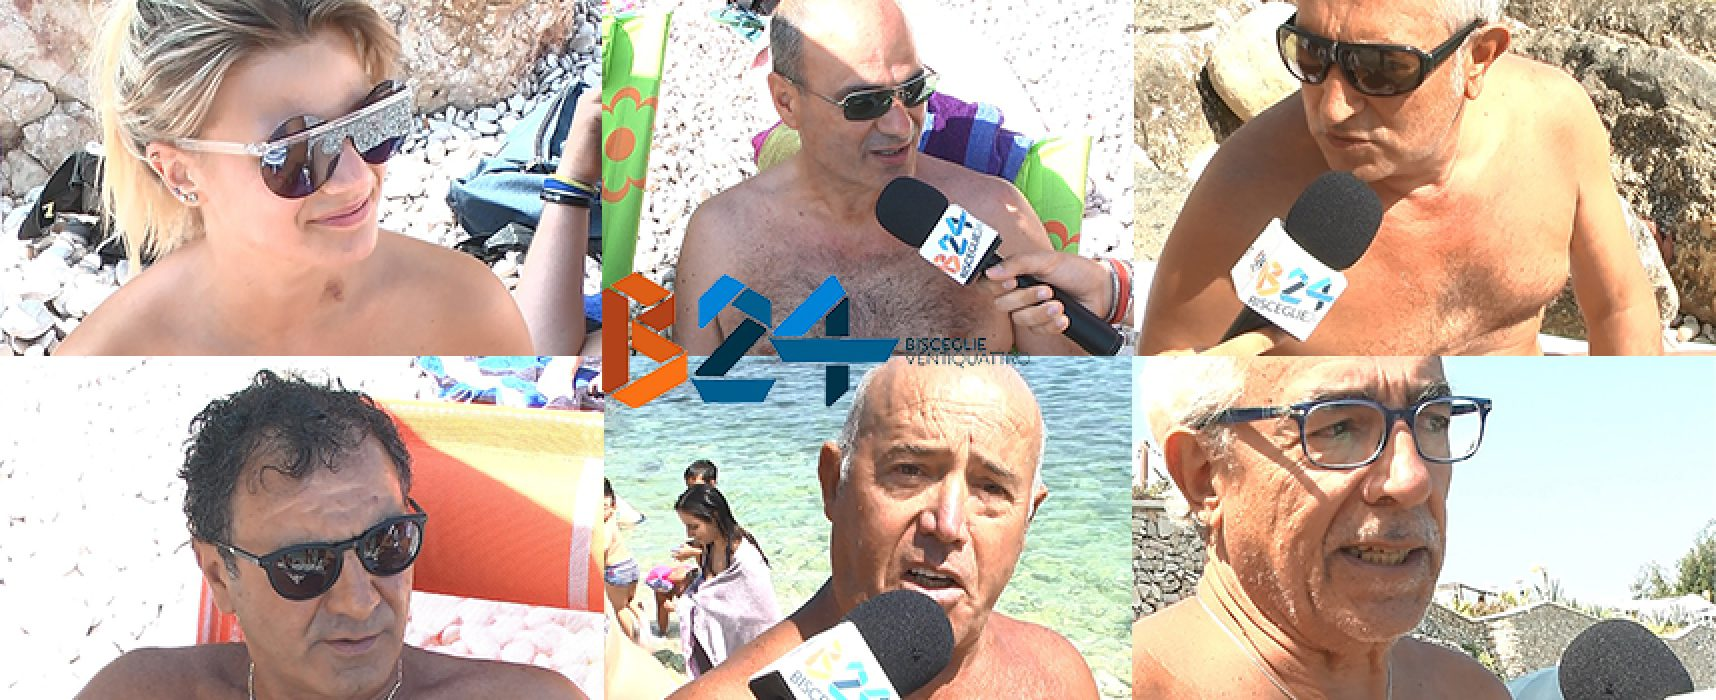 Spiagge biscegliesi, cosa ne pensano i bagnanti? / VIDEO